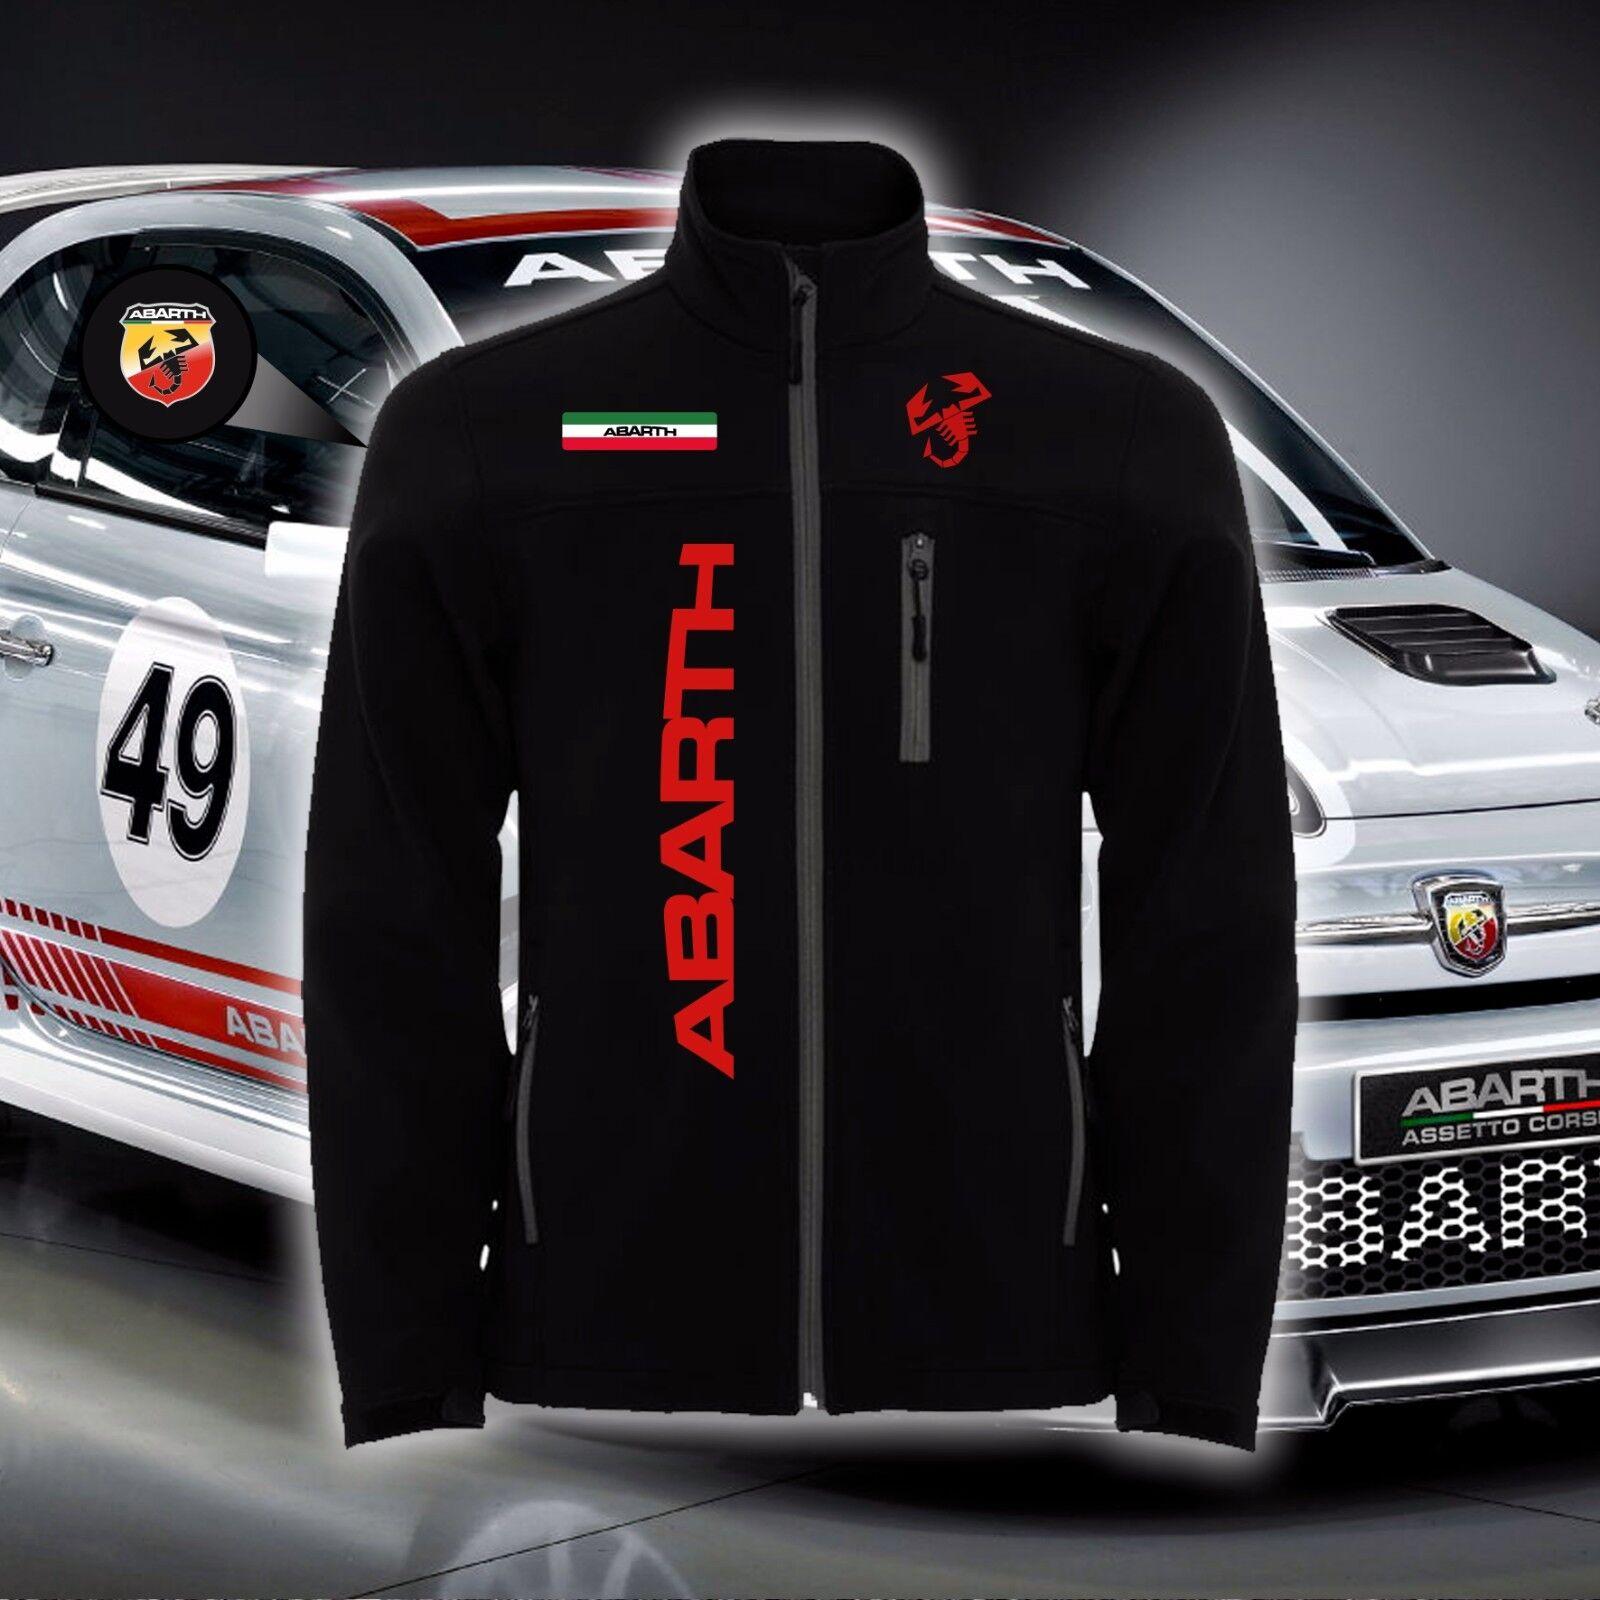 Chaqueta  ABARTH FIAT 595 695 RIVALE Jacket Eclair Unterstand Veste  gran descuento